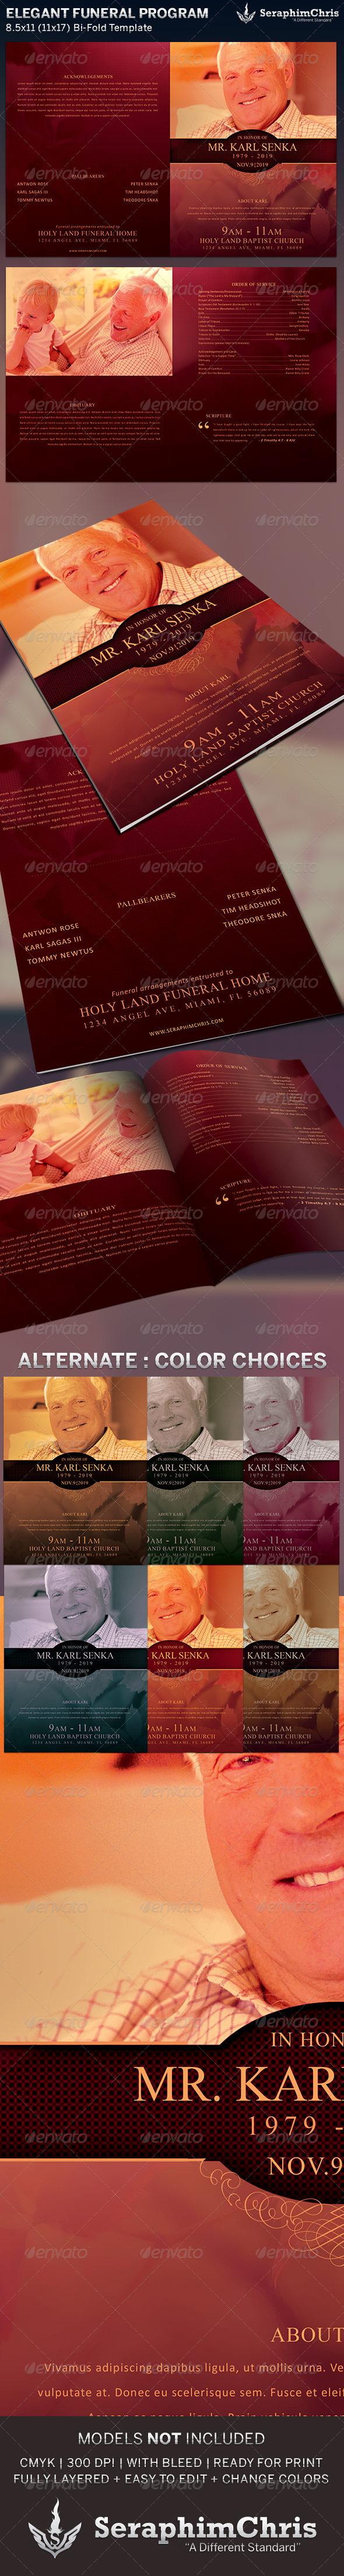 GraphicRiver Elegant Funeral Program Bi-Fold Template 6341646